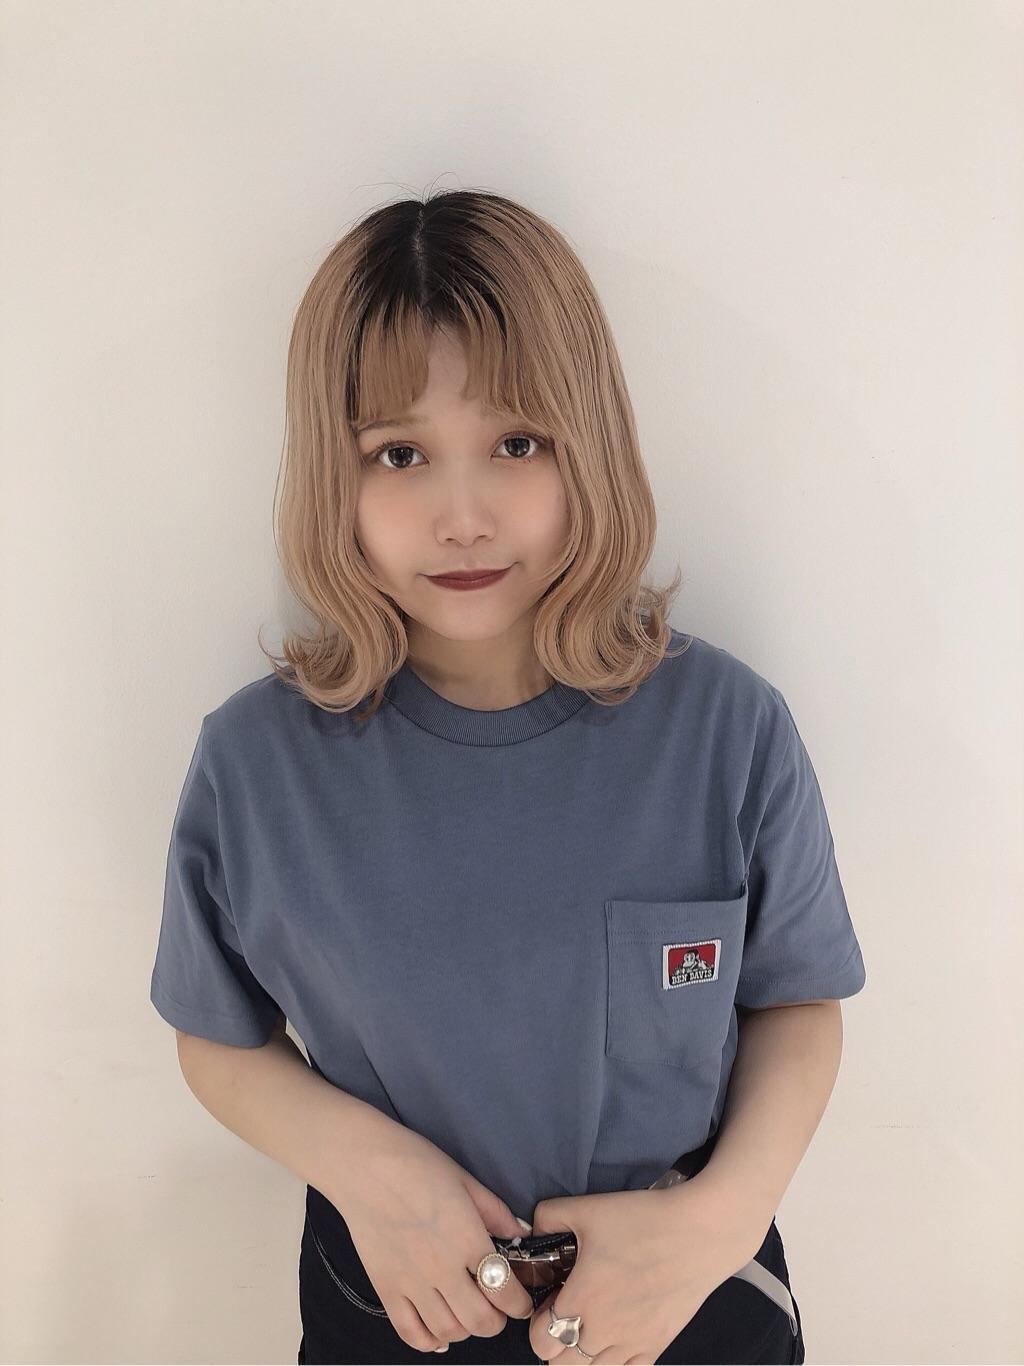 WEGO ららぽーと立川立飛店 ❤︎ mayuka ❤︎